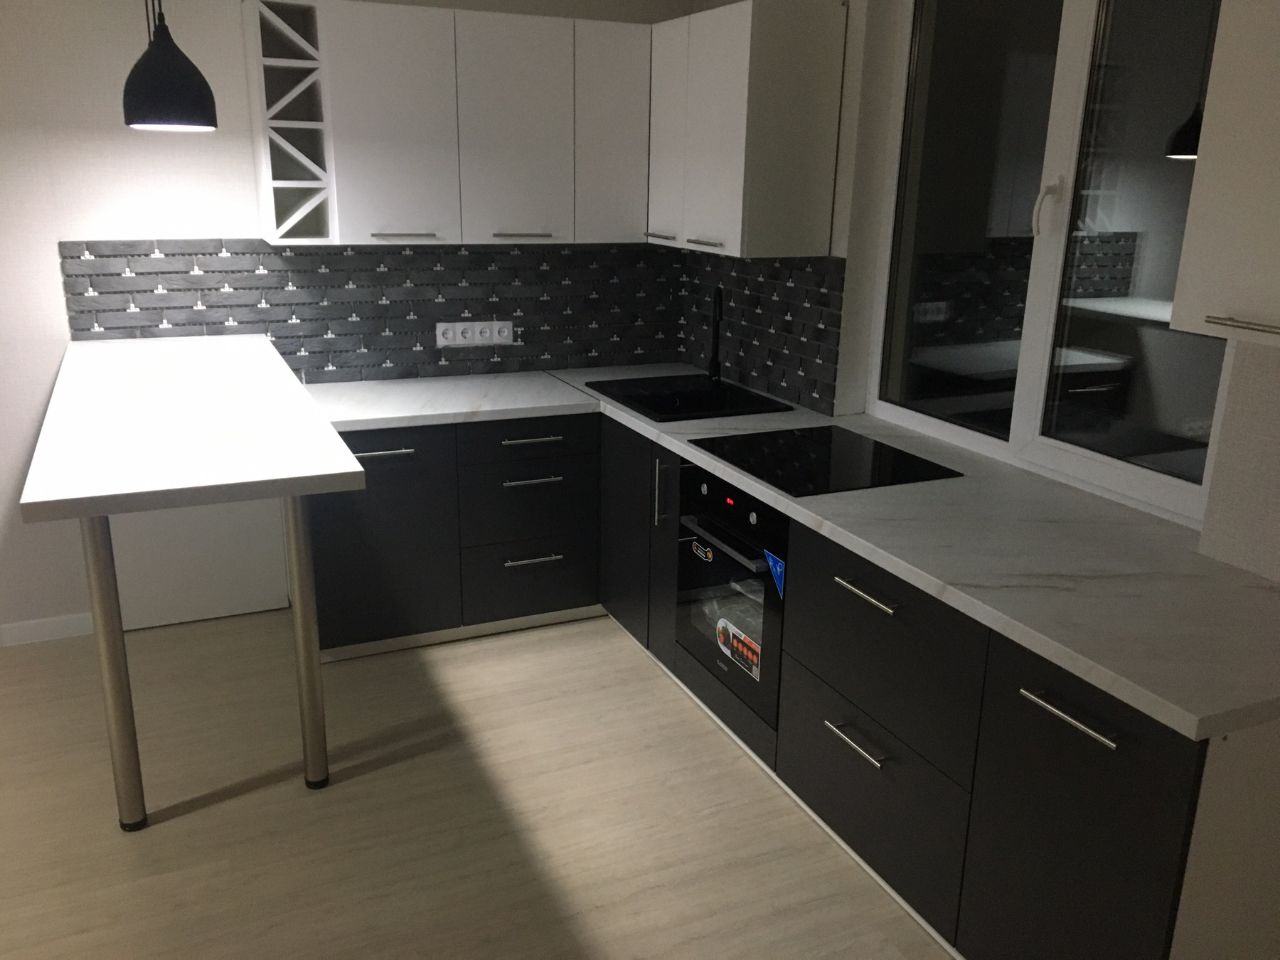 Угловая кухня из ЛДСП